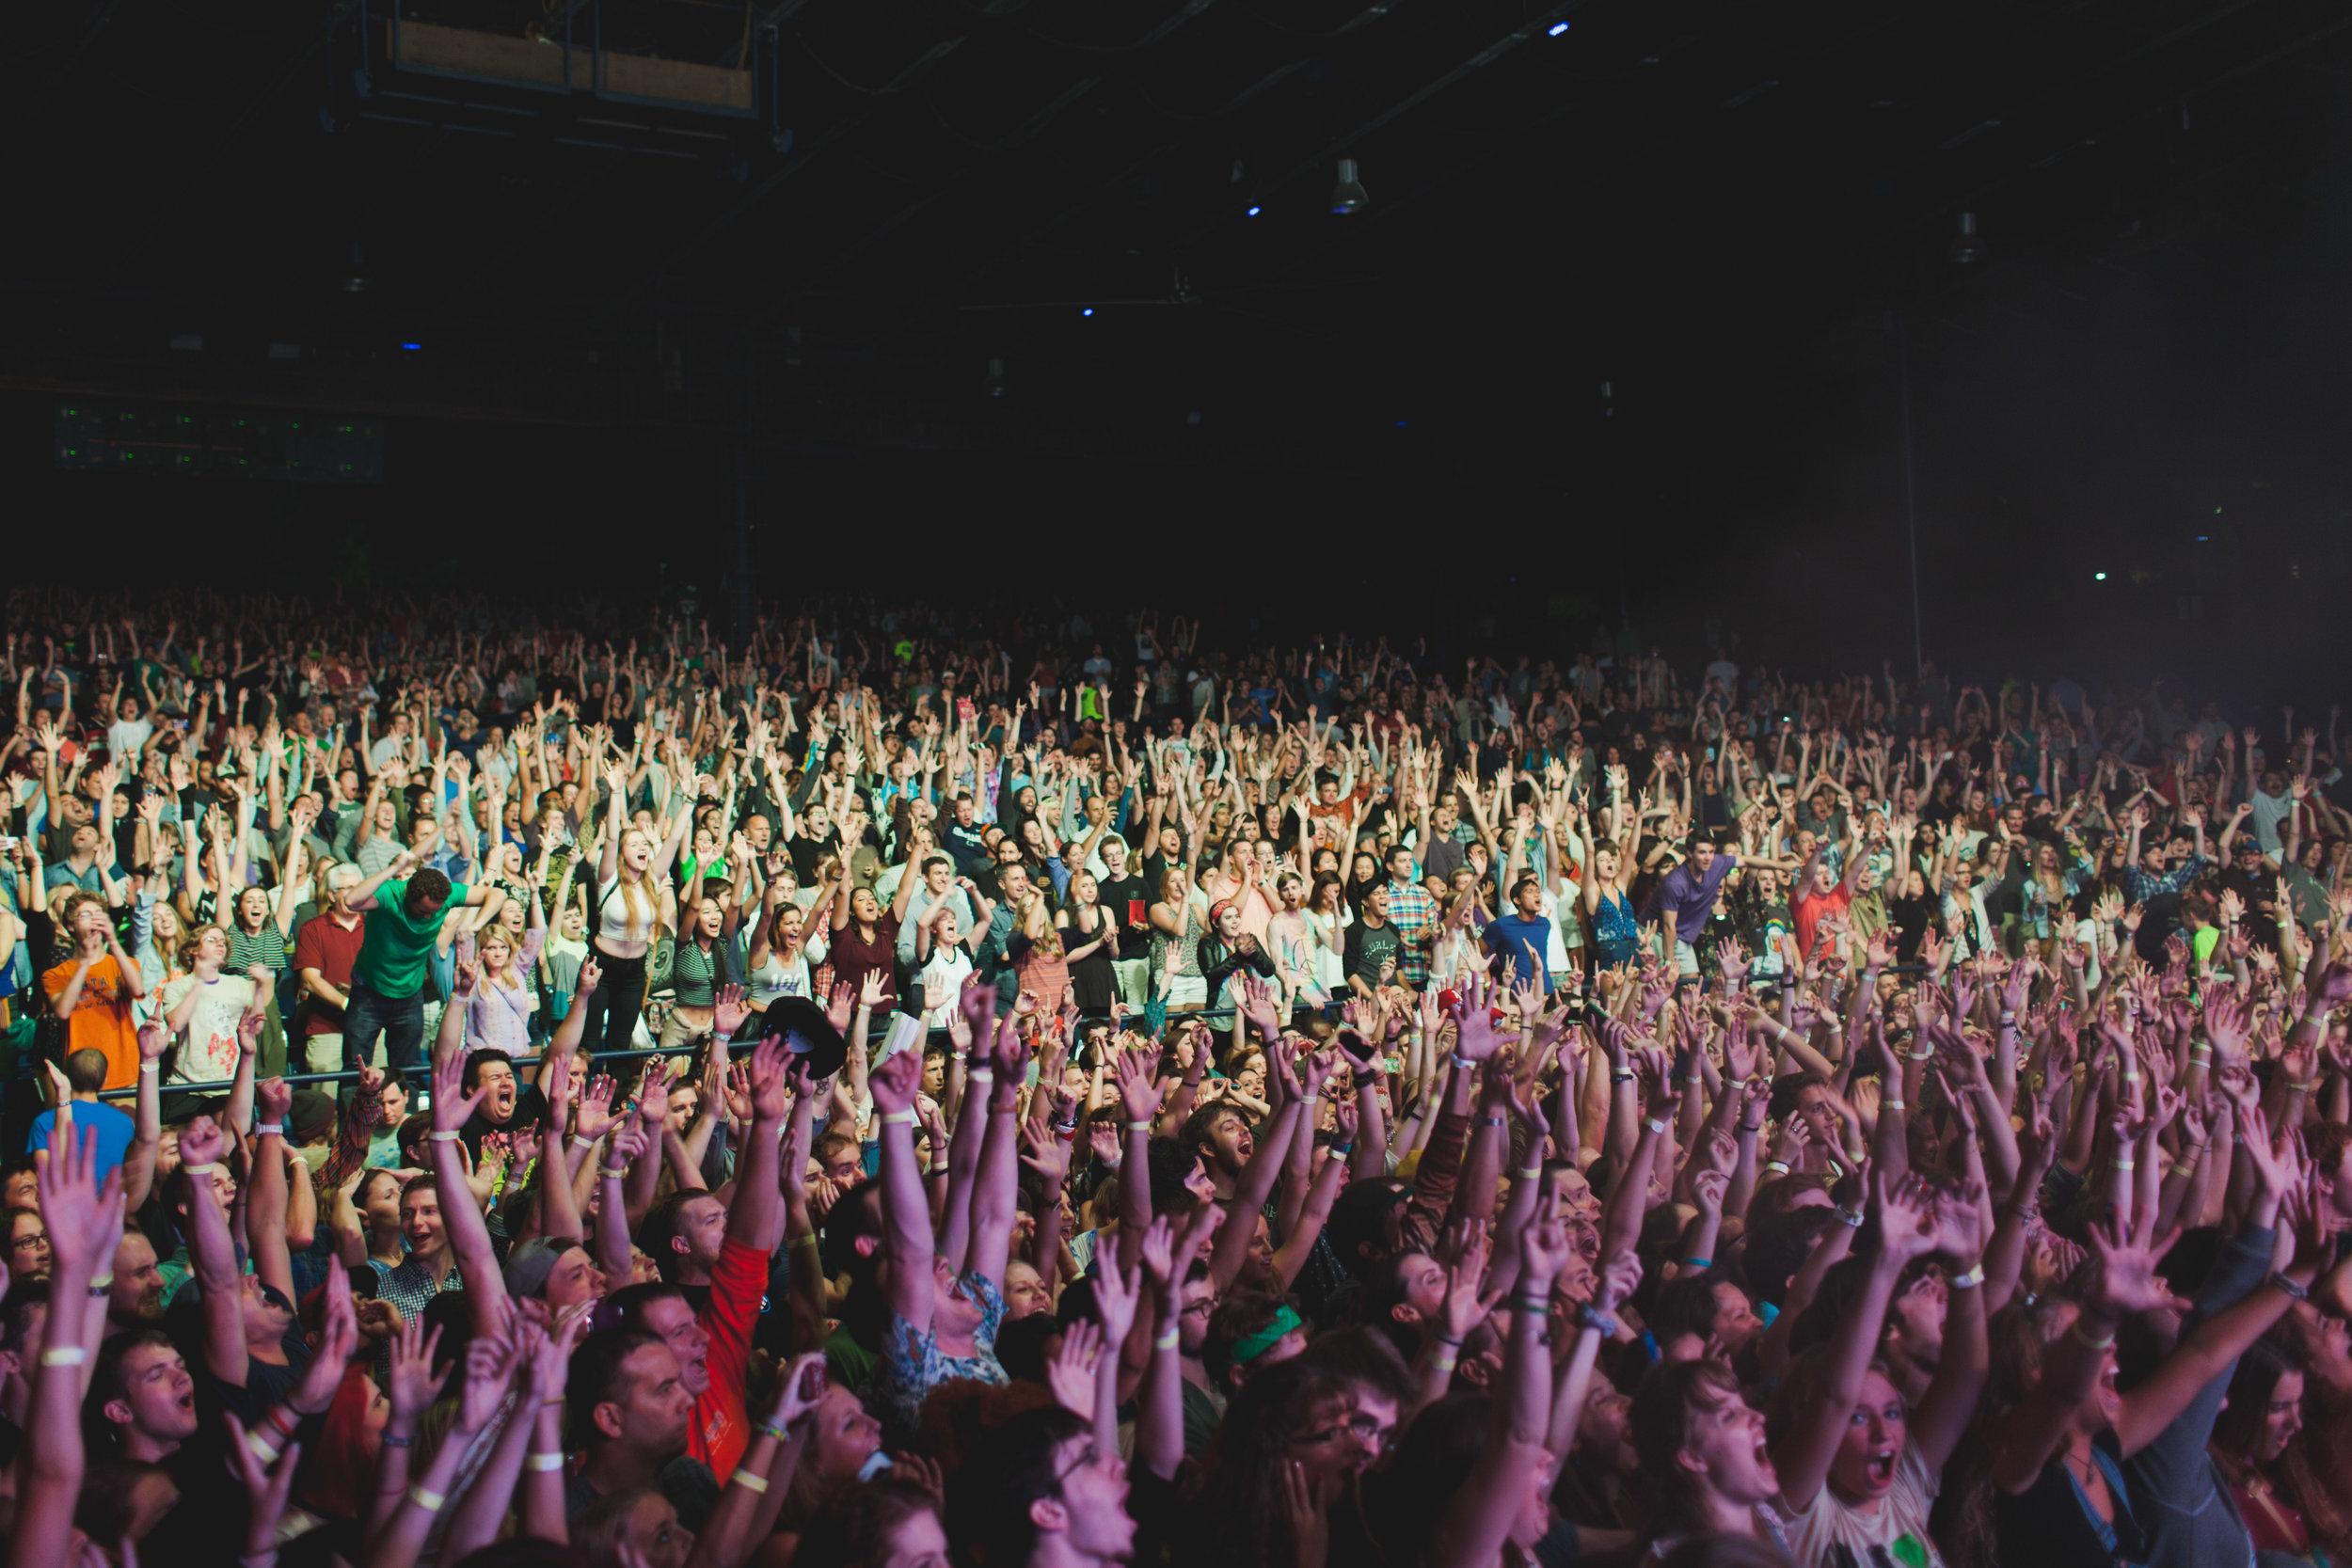 Tour-Fans.jpg